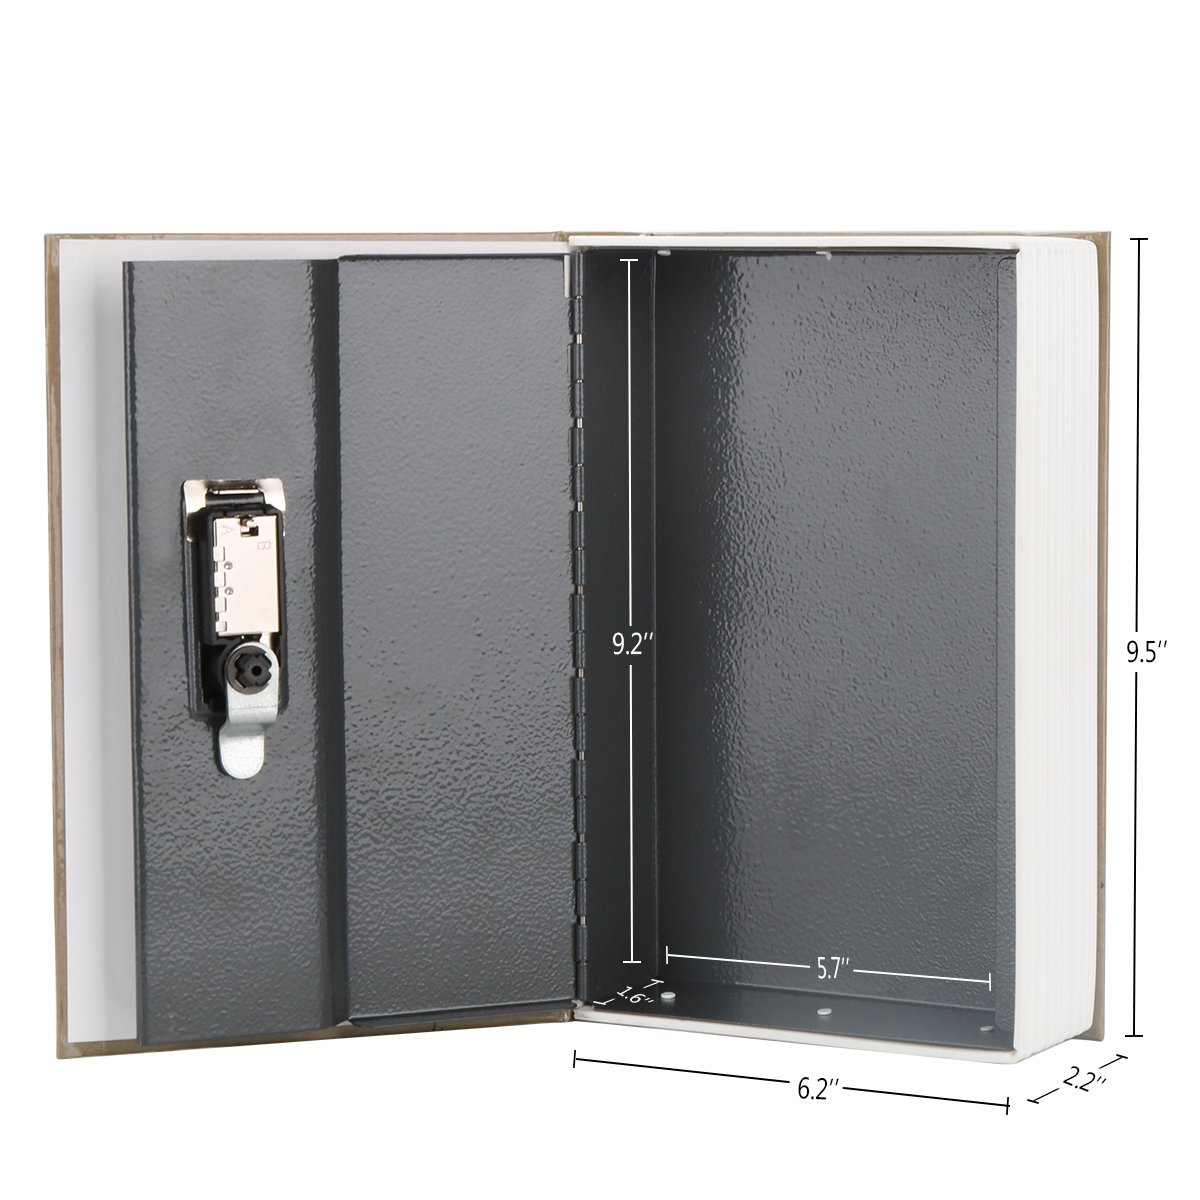 Diversion Book Safe with Combination Lock, Decaller Safe Secret Hidden Metal Lock Box, 9 1/2'' x 6'' x 1 1/3'', New York by Decaller (Image #3)